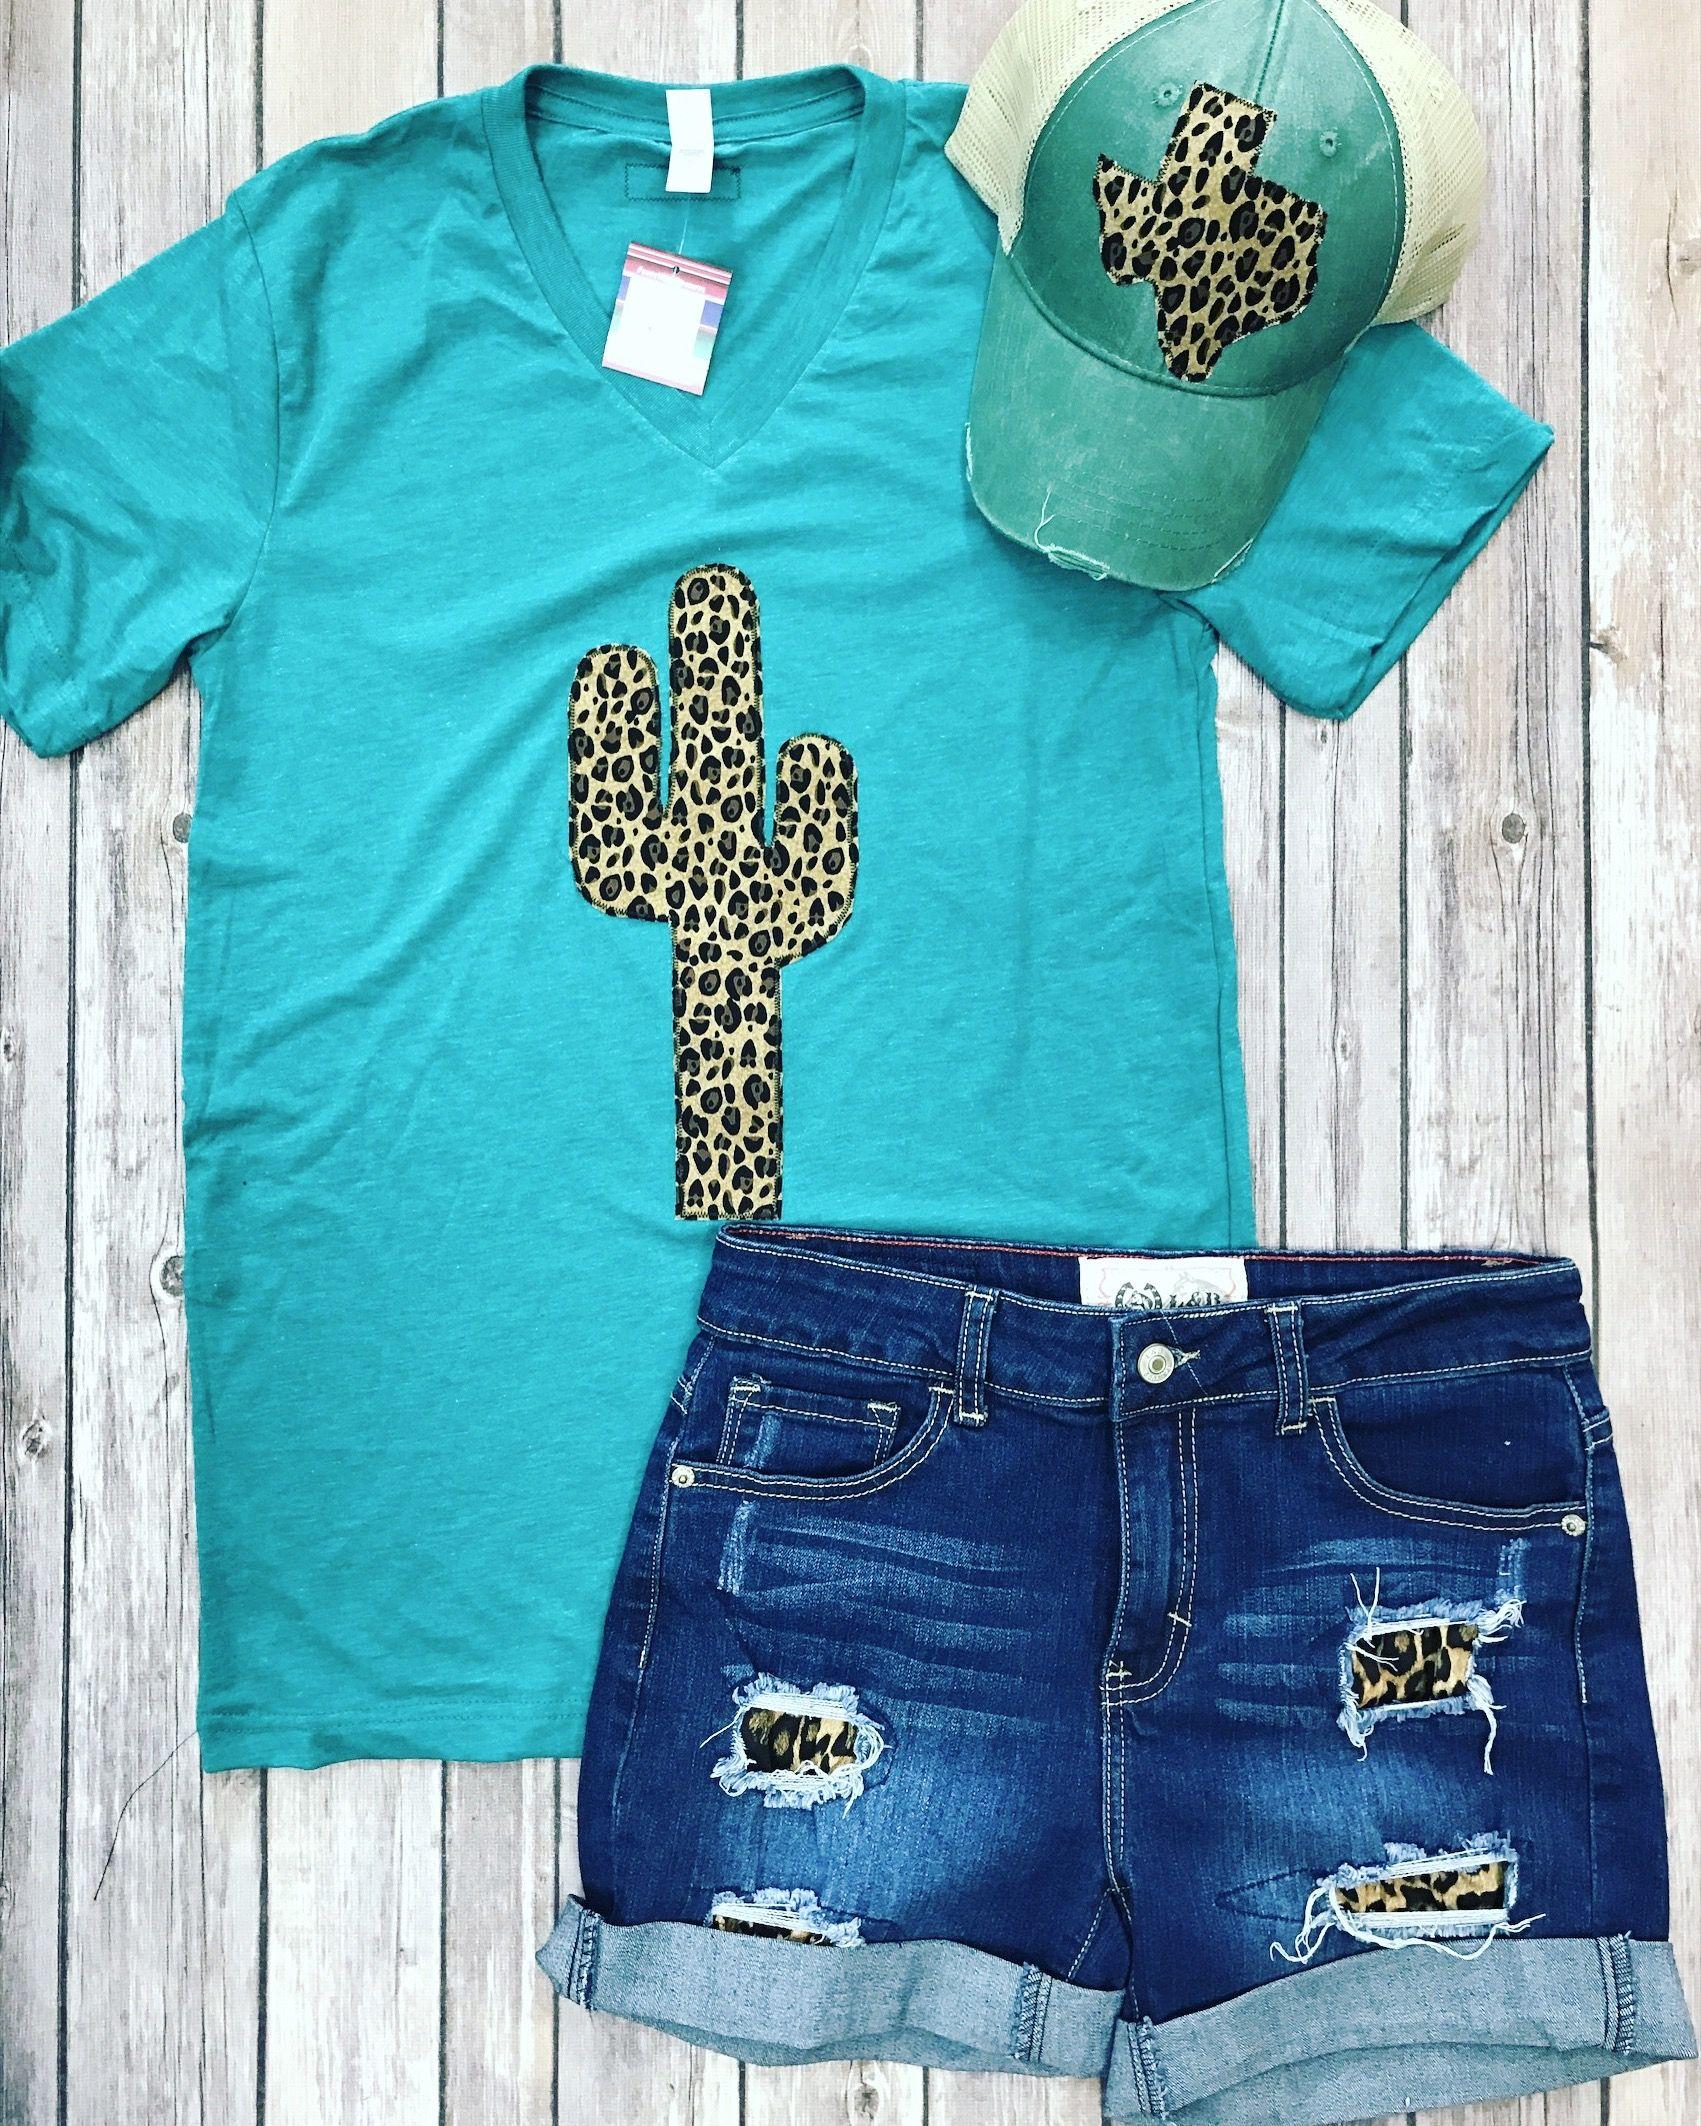 def8aafc Leopard Print Cactus tee by Sweettexastreasures Cheetah Print Shirts, Cheetah  Print Outfits, Leopard Shirt